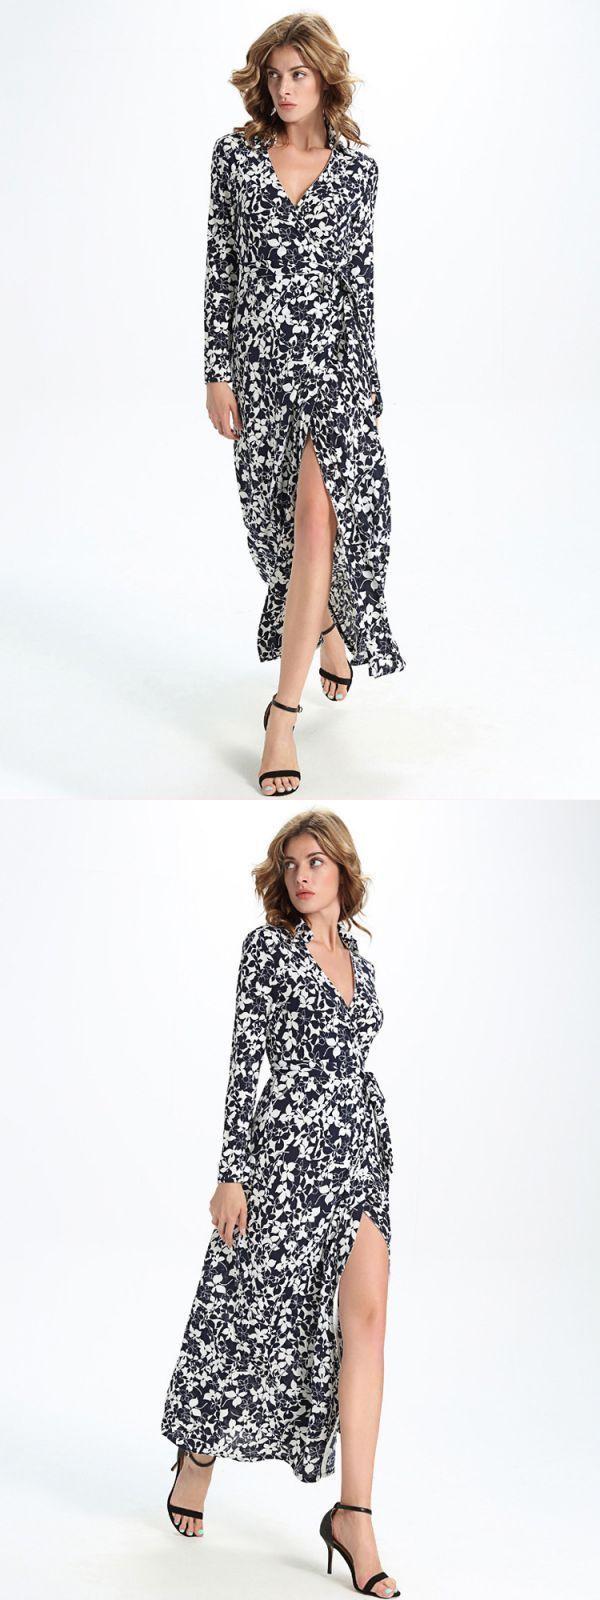 Women Dot Printed Dress NDGDA Short Sleeve Bandage Button Casual Beach Dress